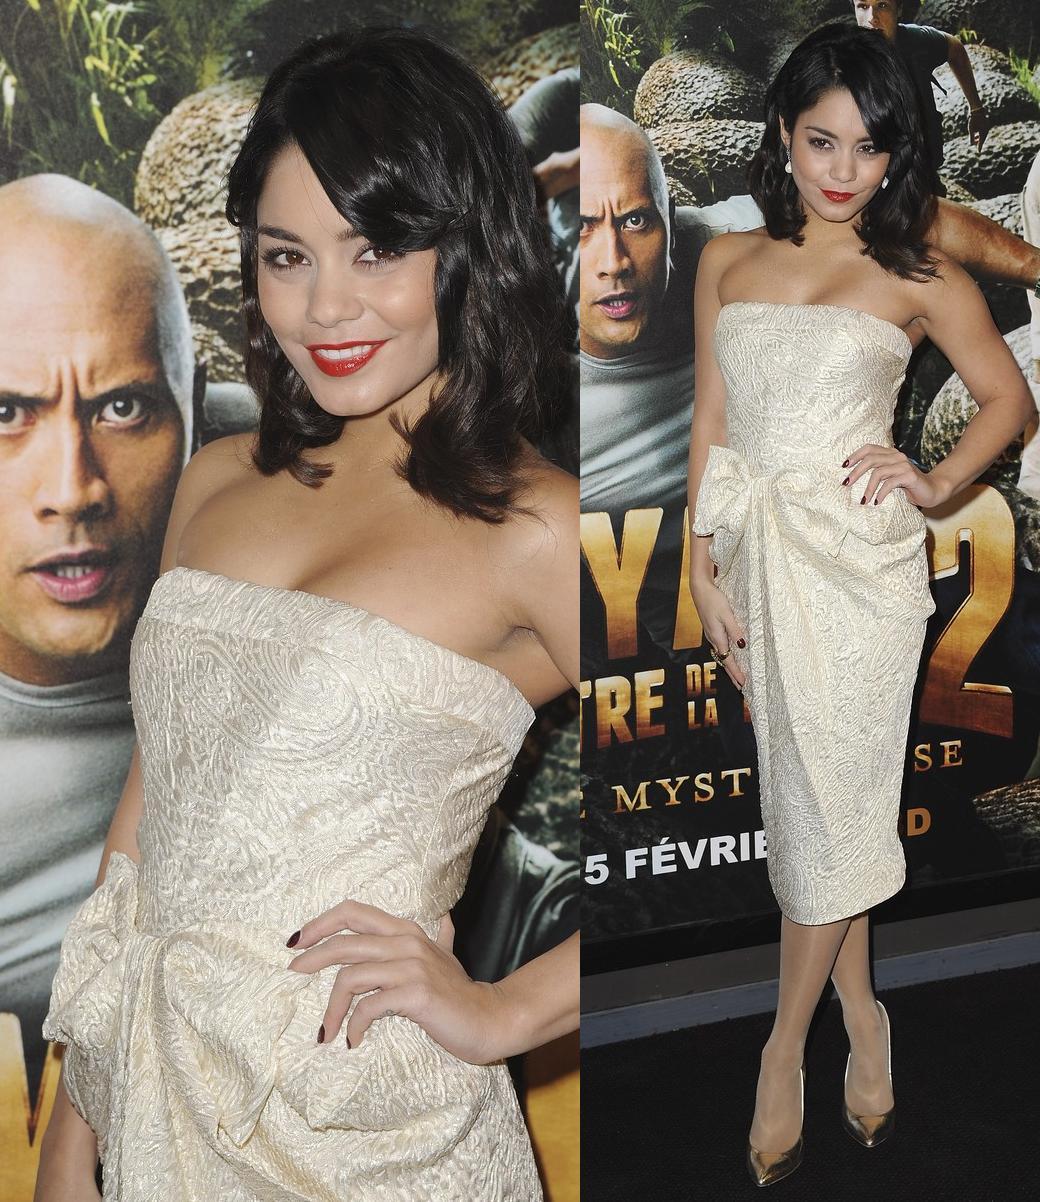 http://2.bp.blogspot.com/-8bMDSAtT6lA/TzwEum5FImI/AAAAAAAAE5Q/UUuPzIdyMQg/s1600/Vanessa+Hudgens+In+Moschino.jpg